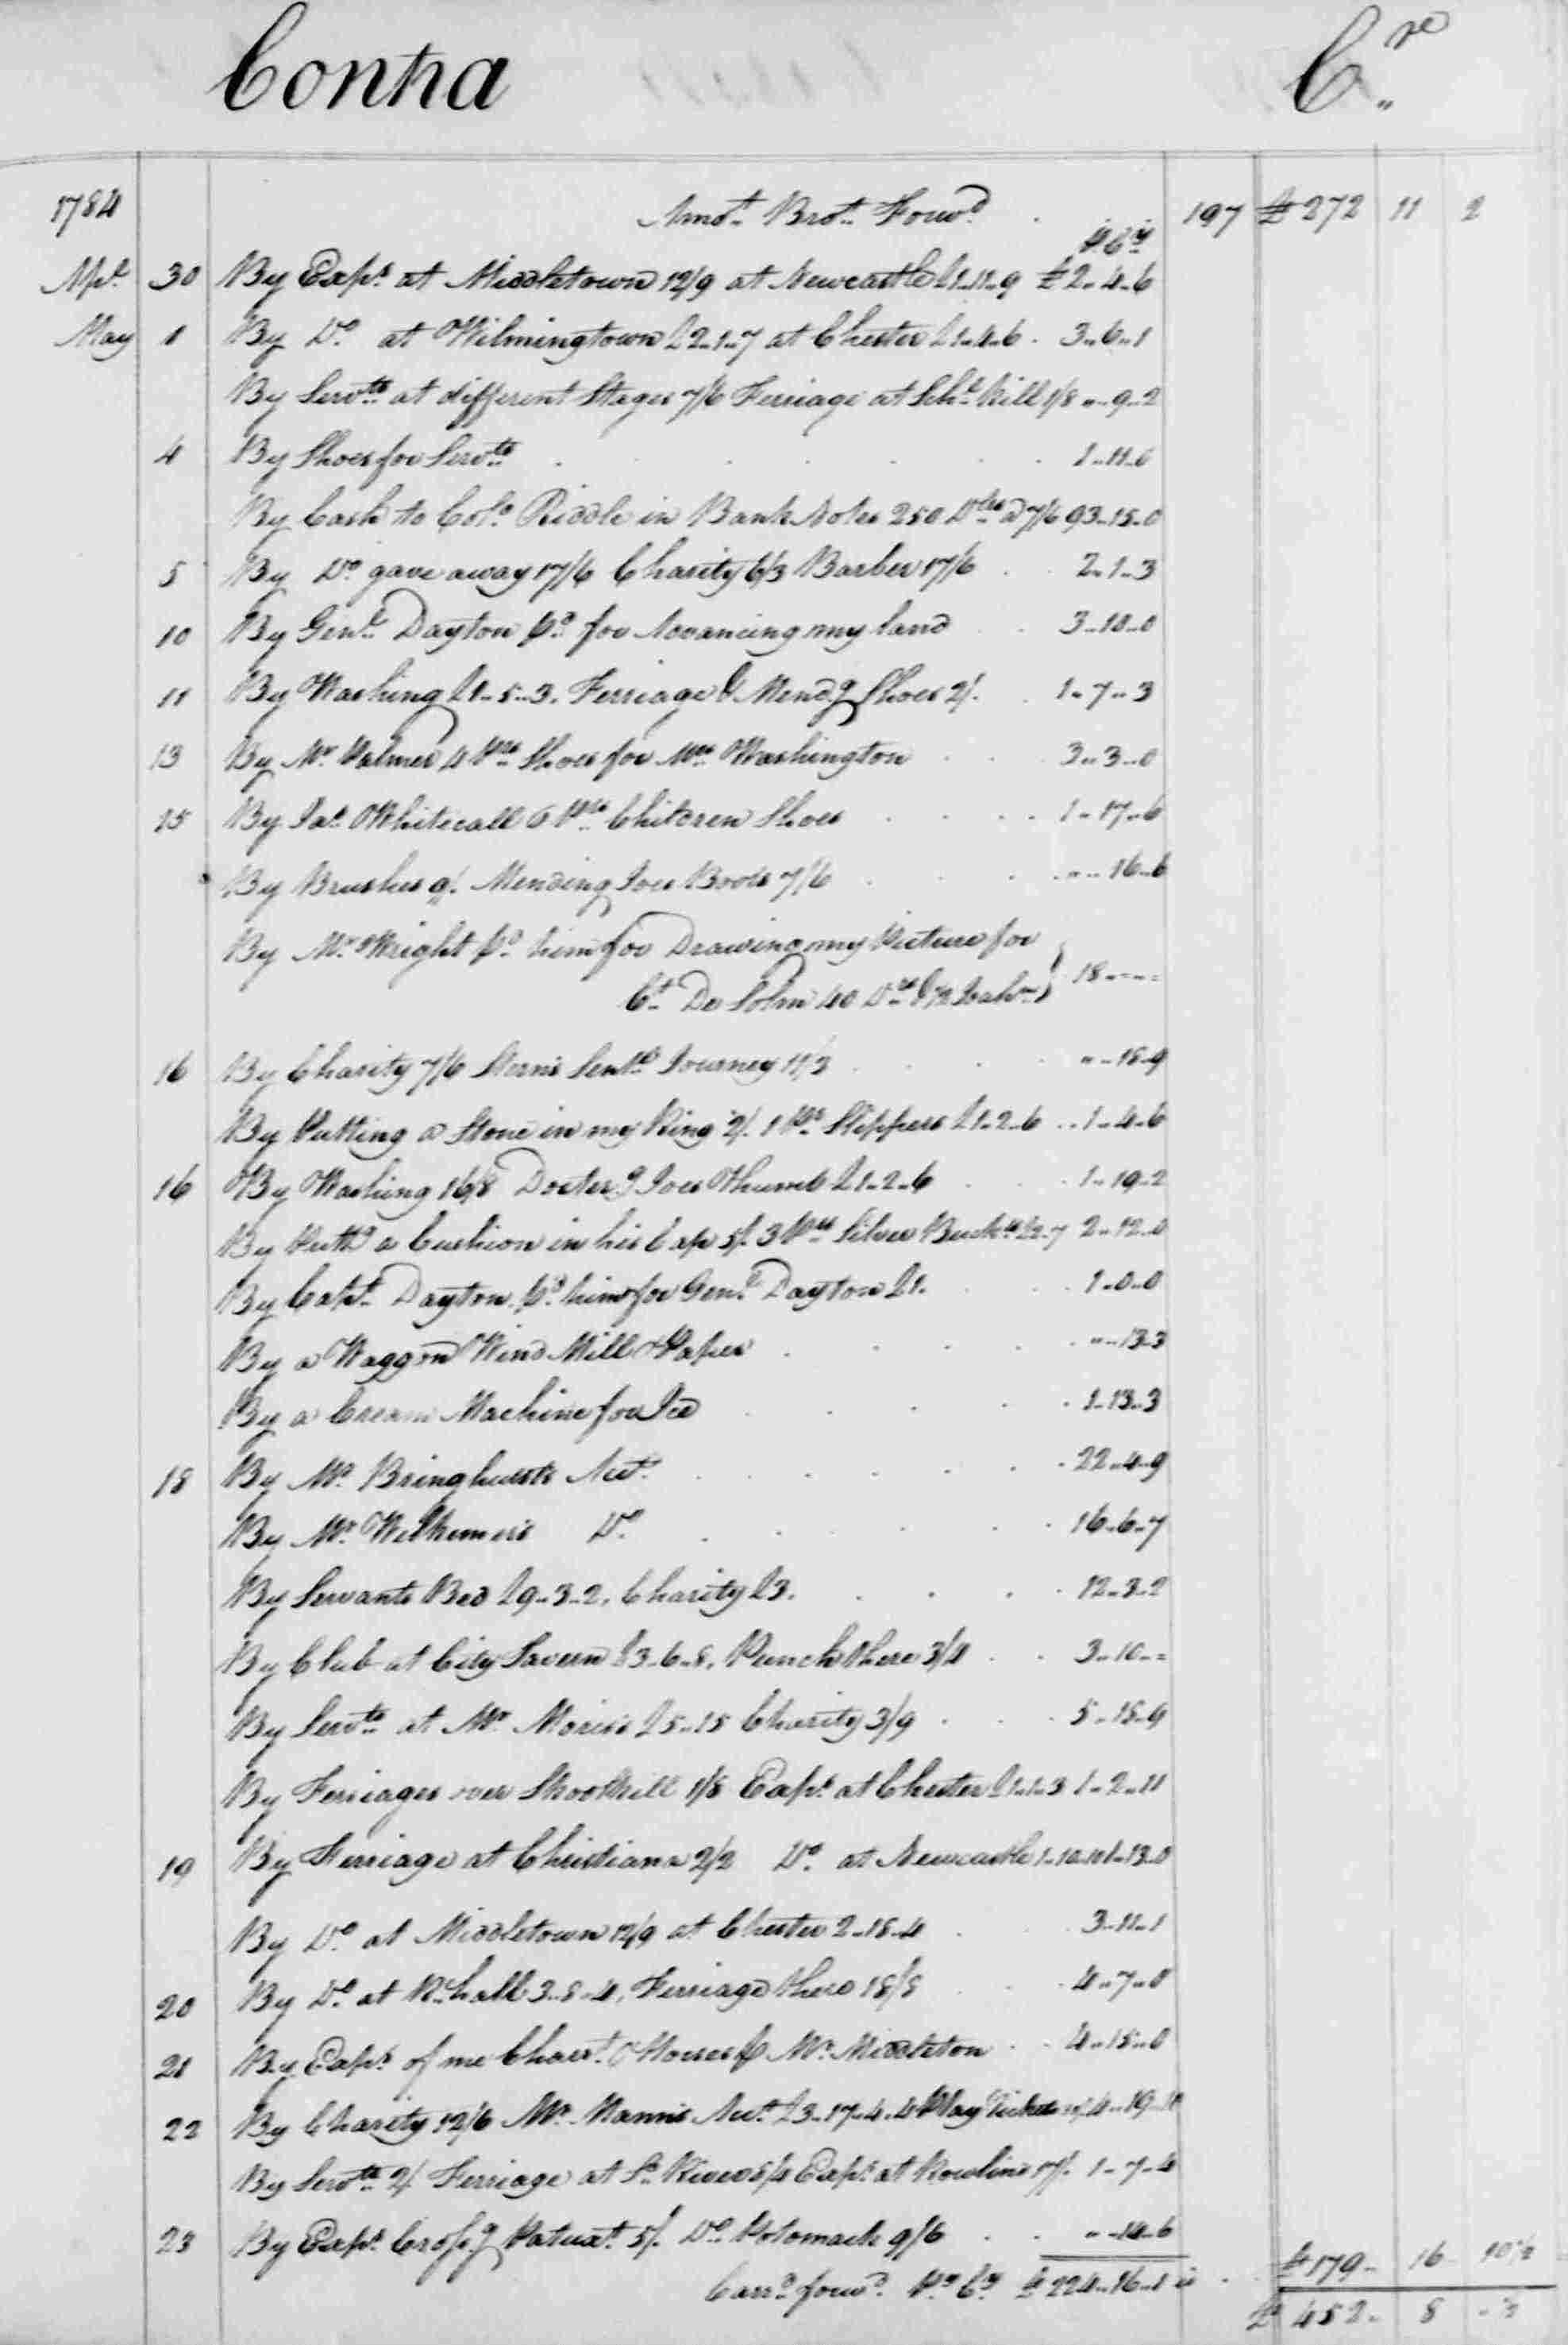 Ledger B, folio 198, right side